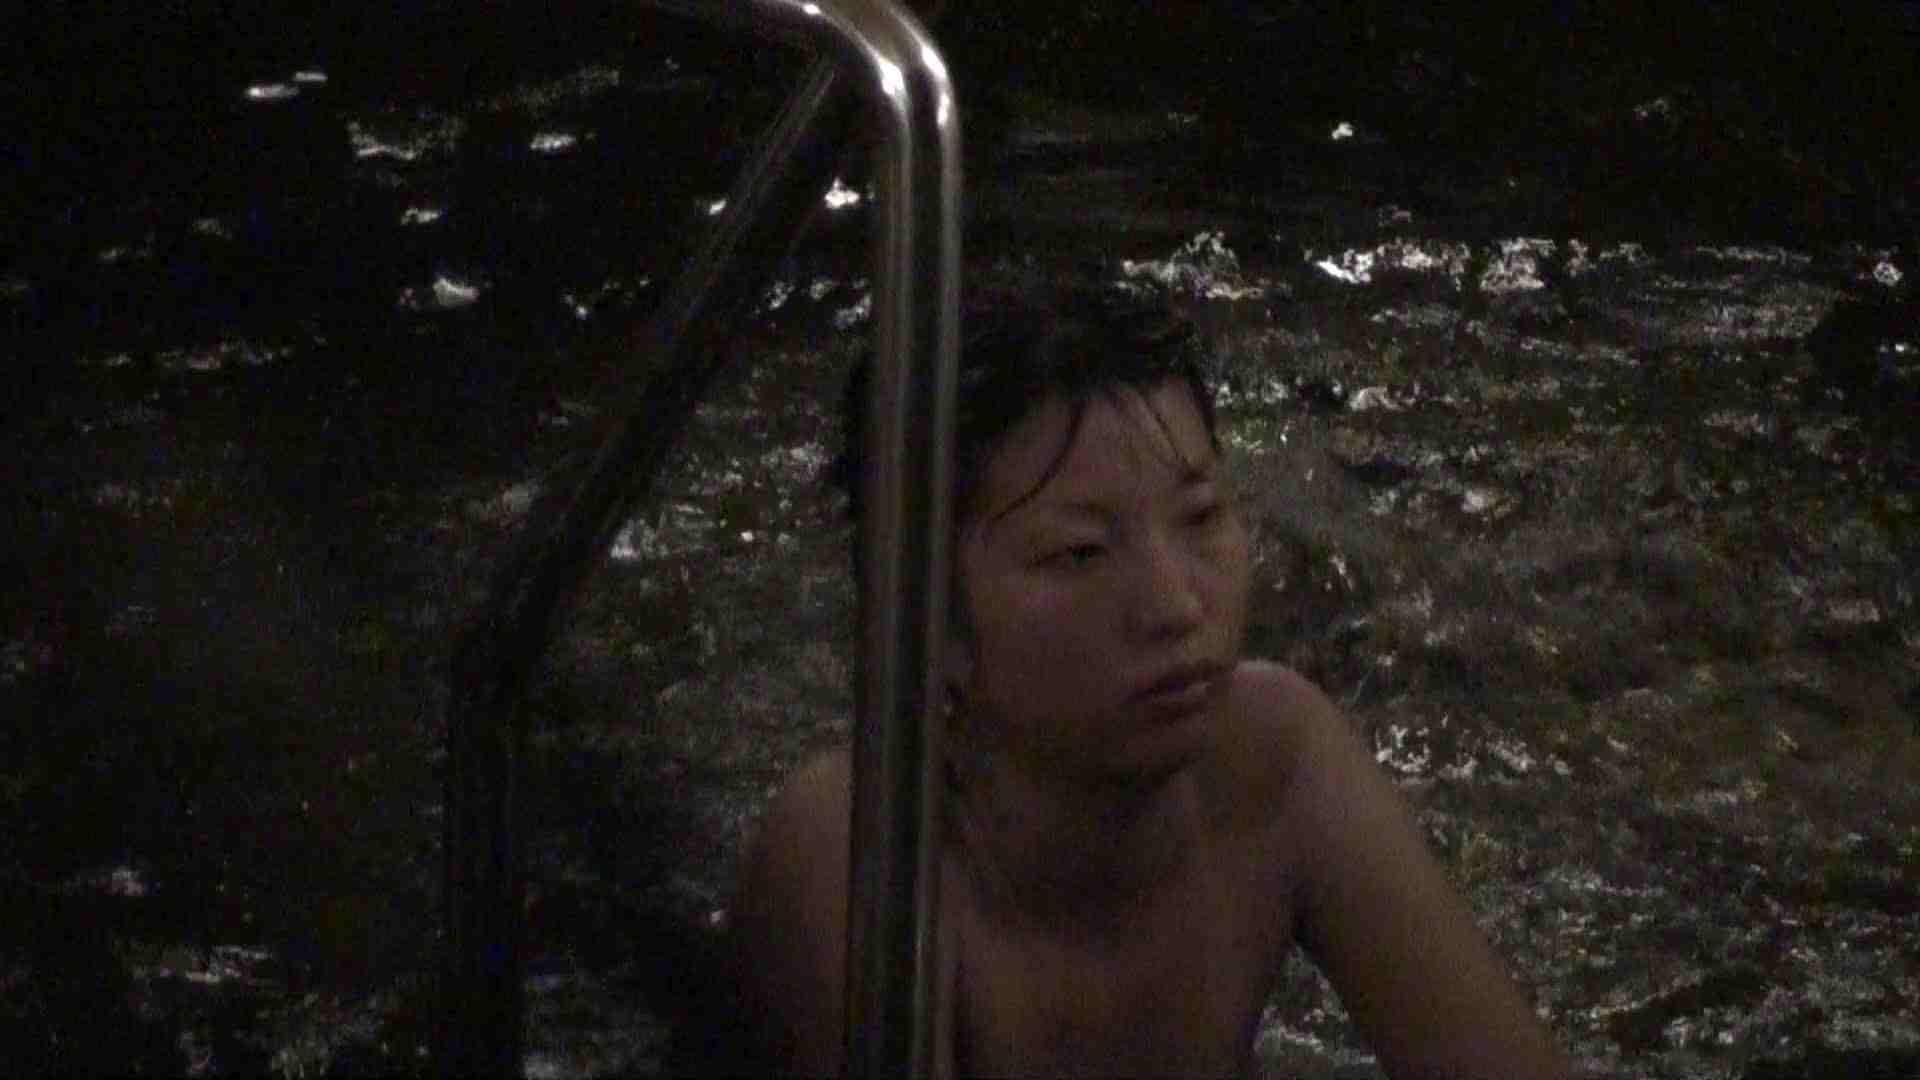 Aquaな露天風呂Vol.379 盗撮映像  41Pix 22